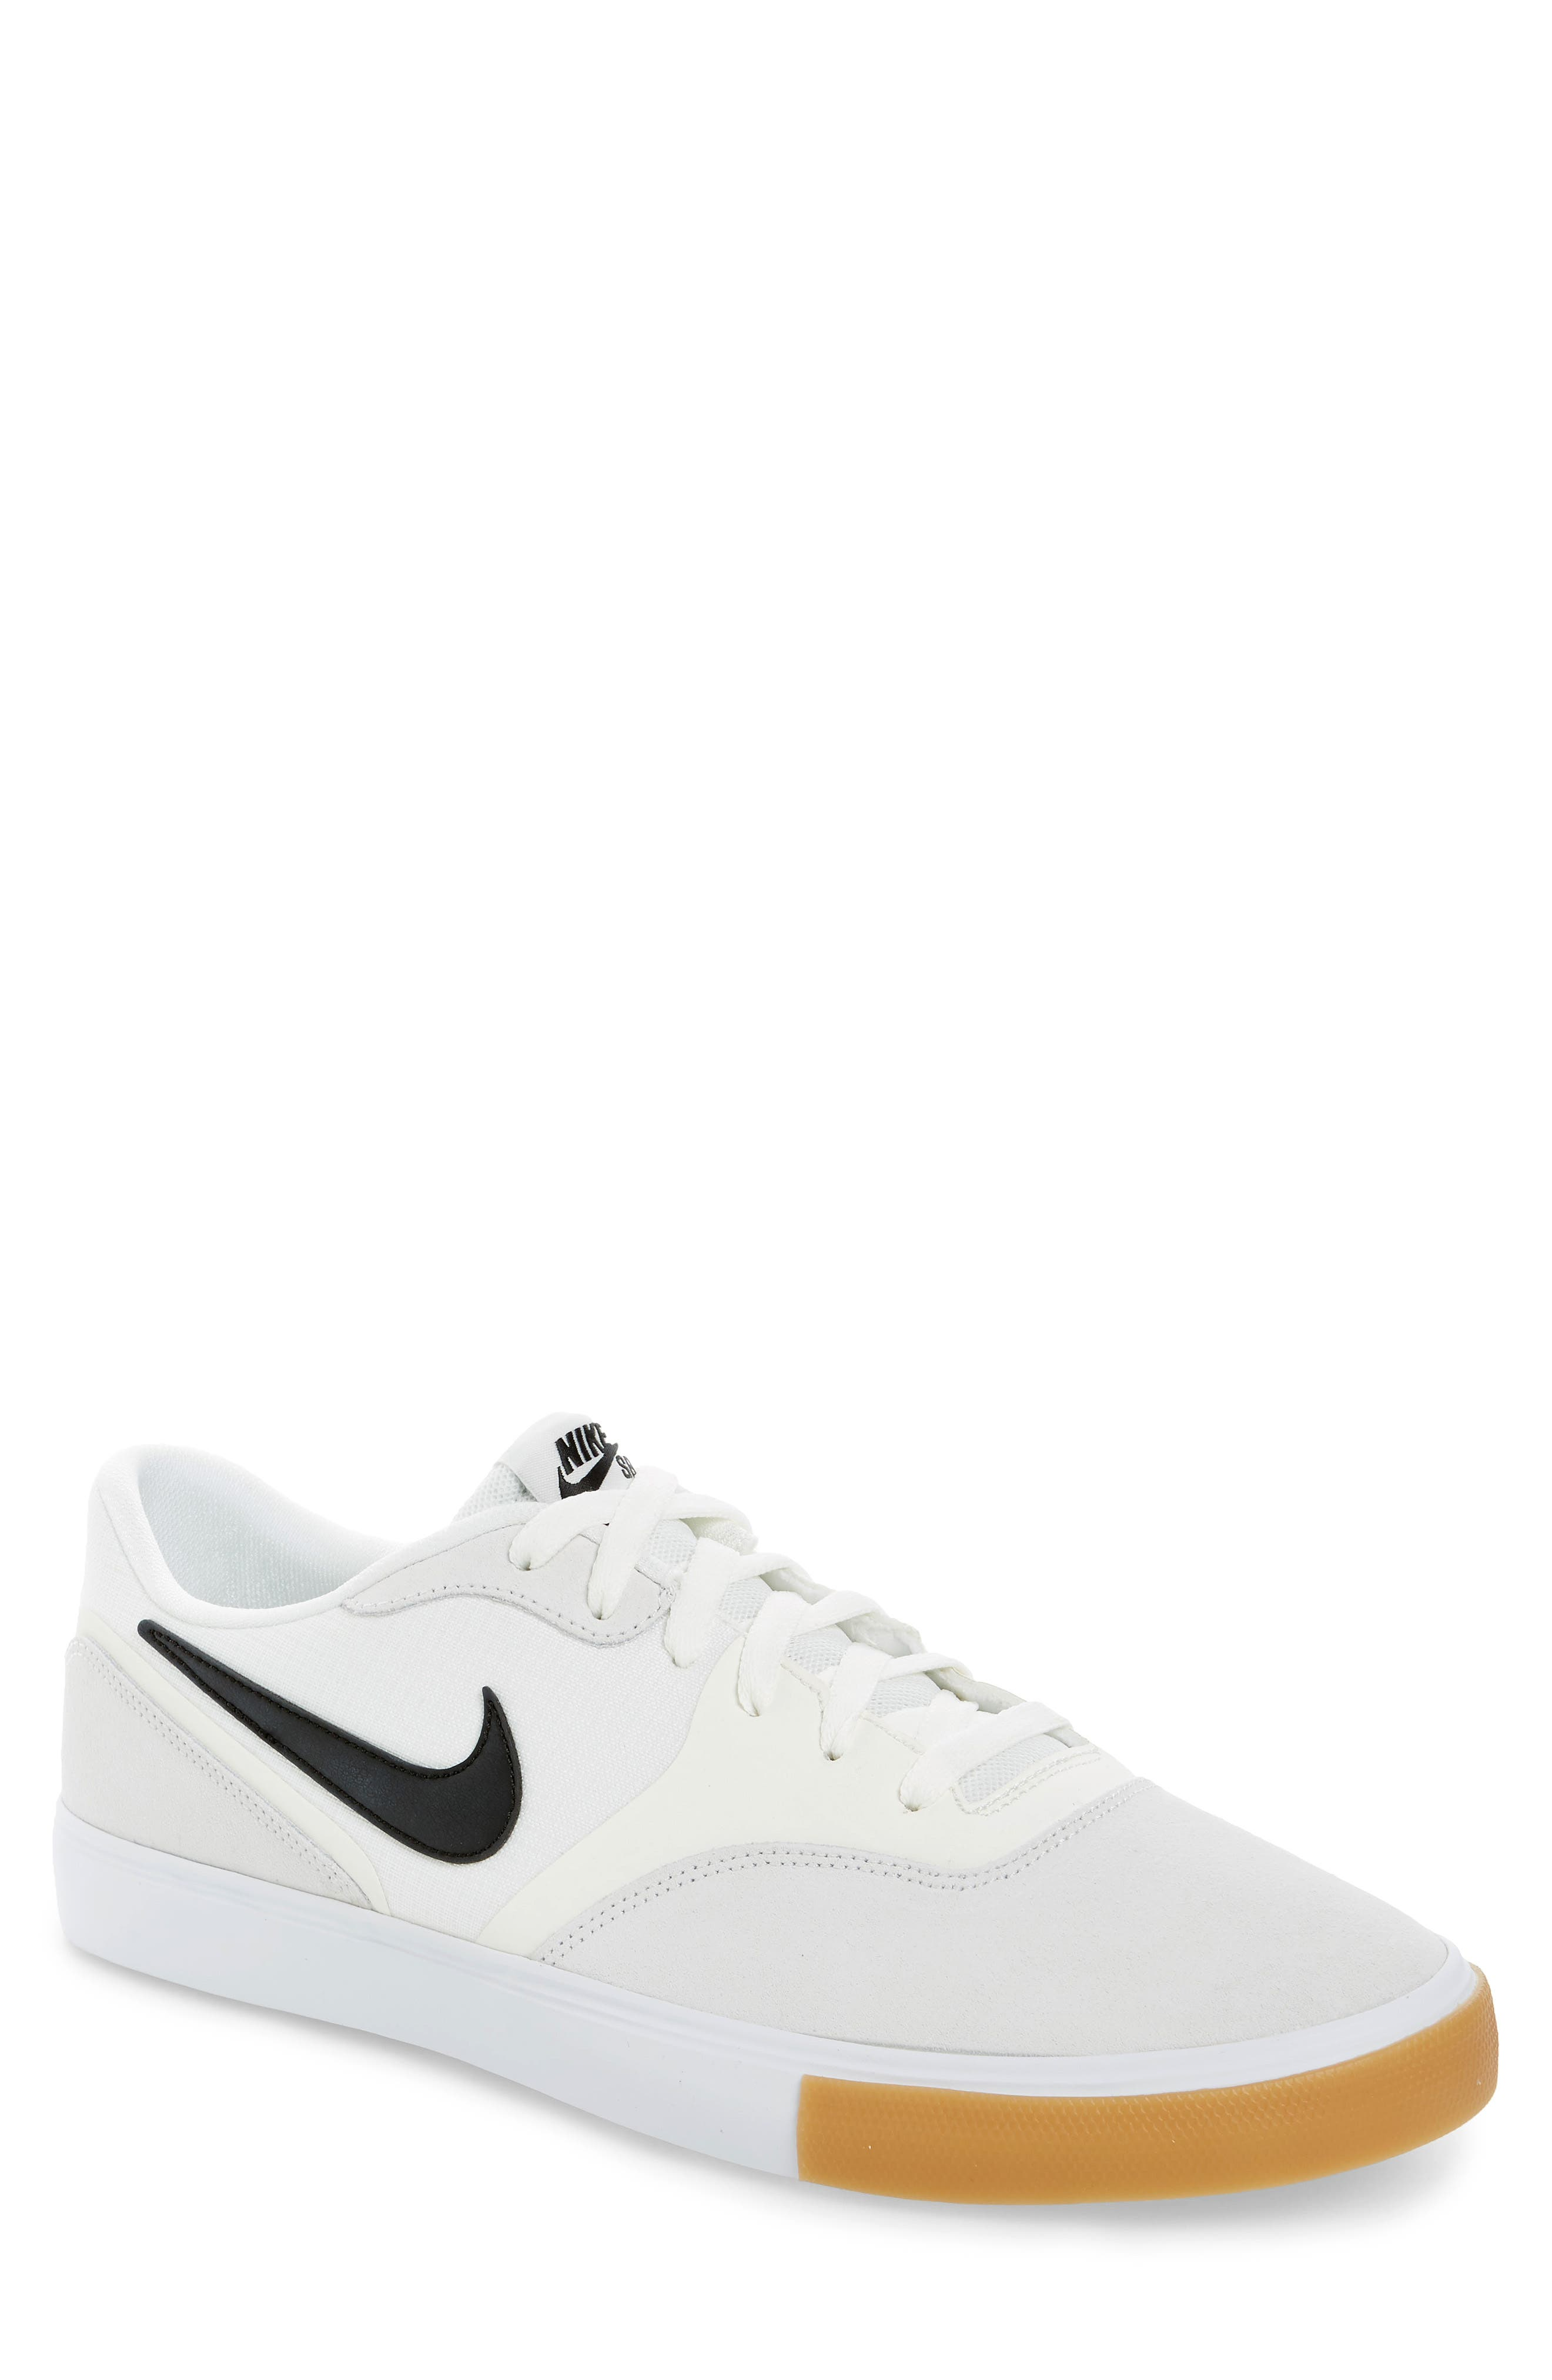 SB Paul Rodriguez 9 VR Skateboarding Sneaker,                         Main,                         color, White/ Black/ Black